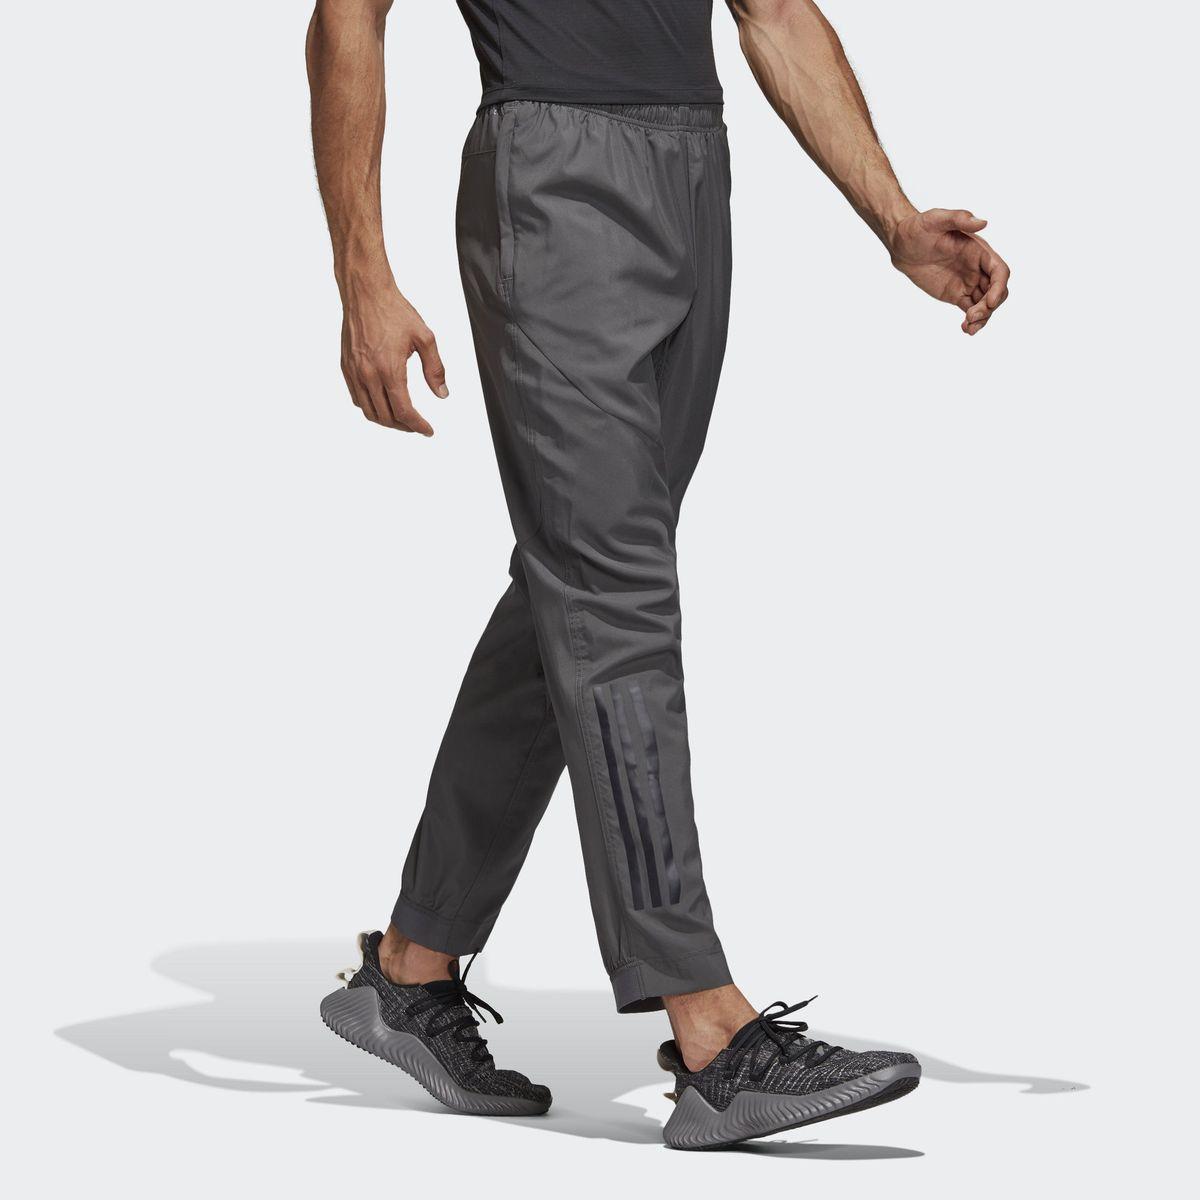 pantalon adidas homme climacool